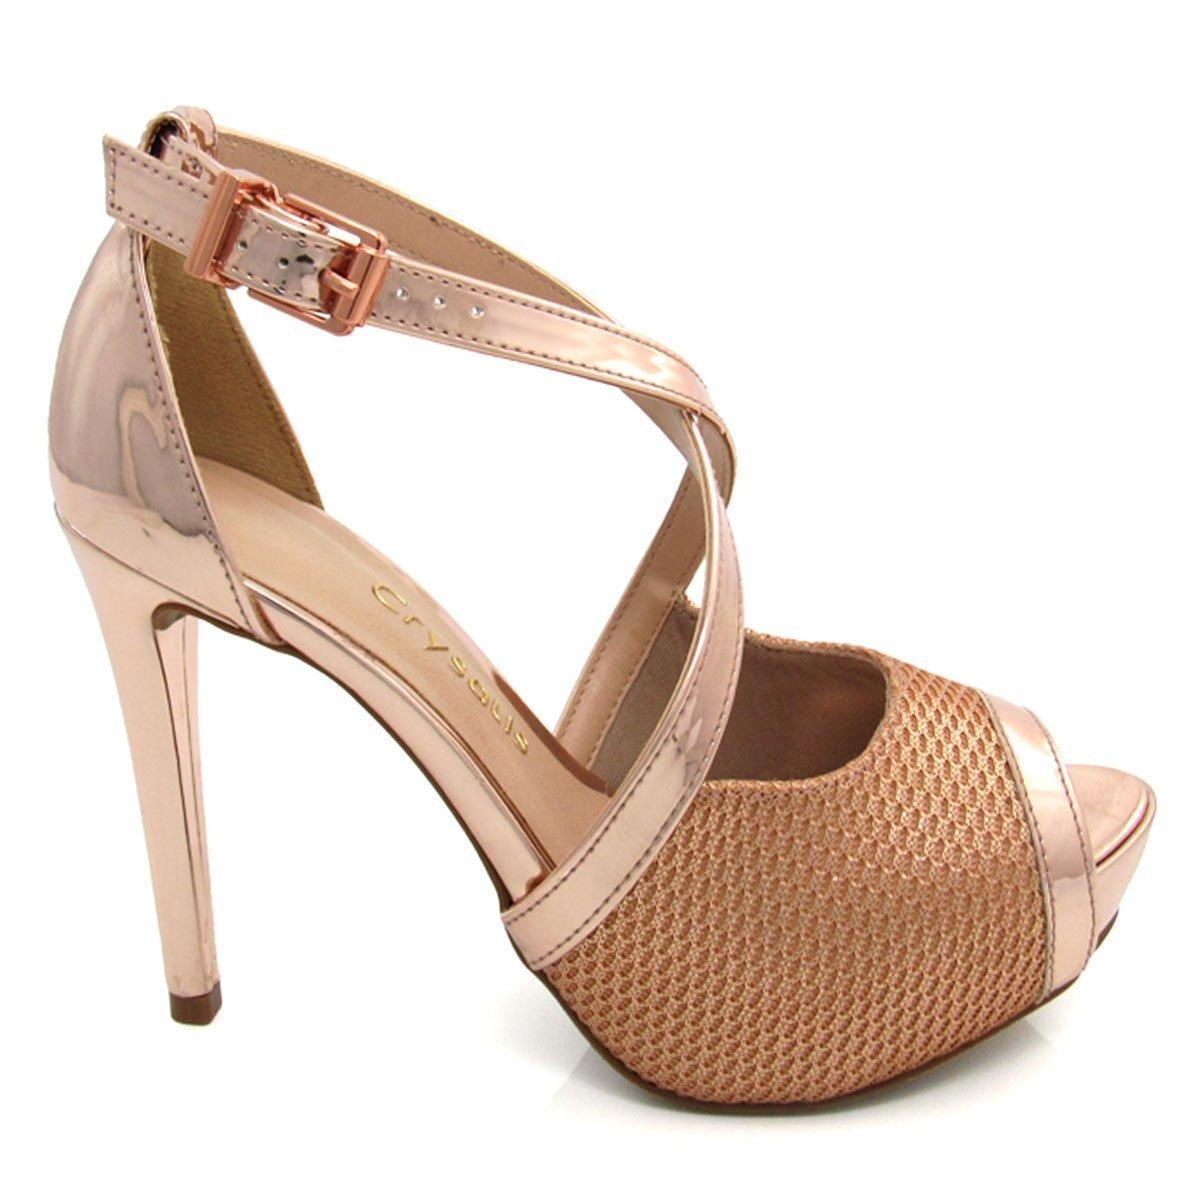 99c688f187 sandália feminina meia pata salto fino crysalis 42096057. Carregando zoom.